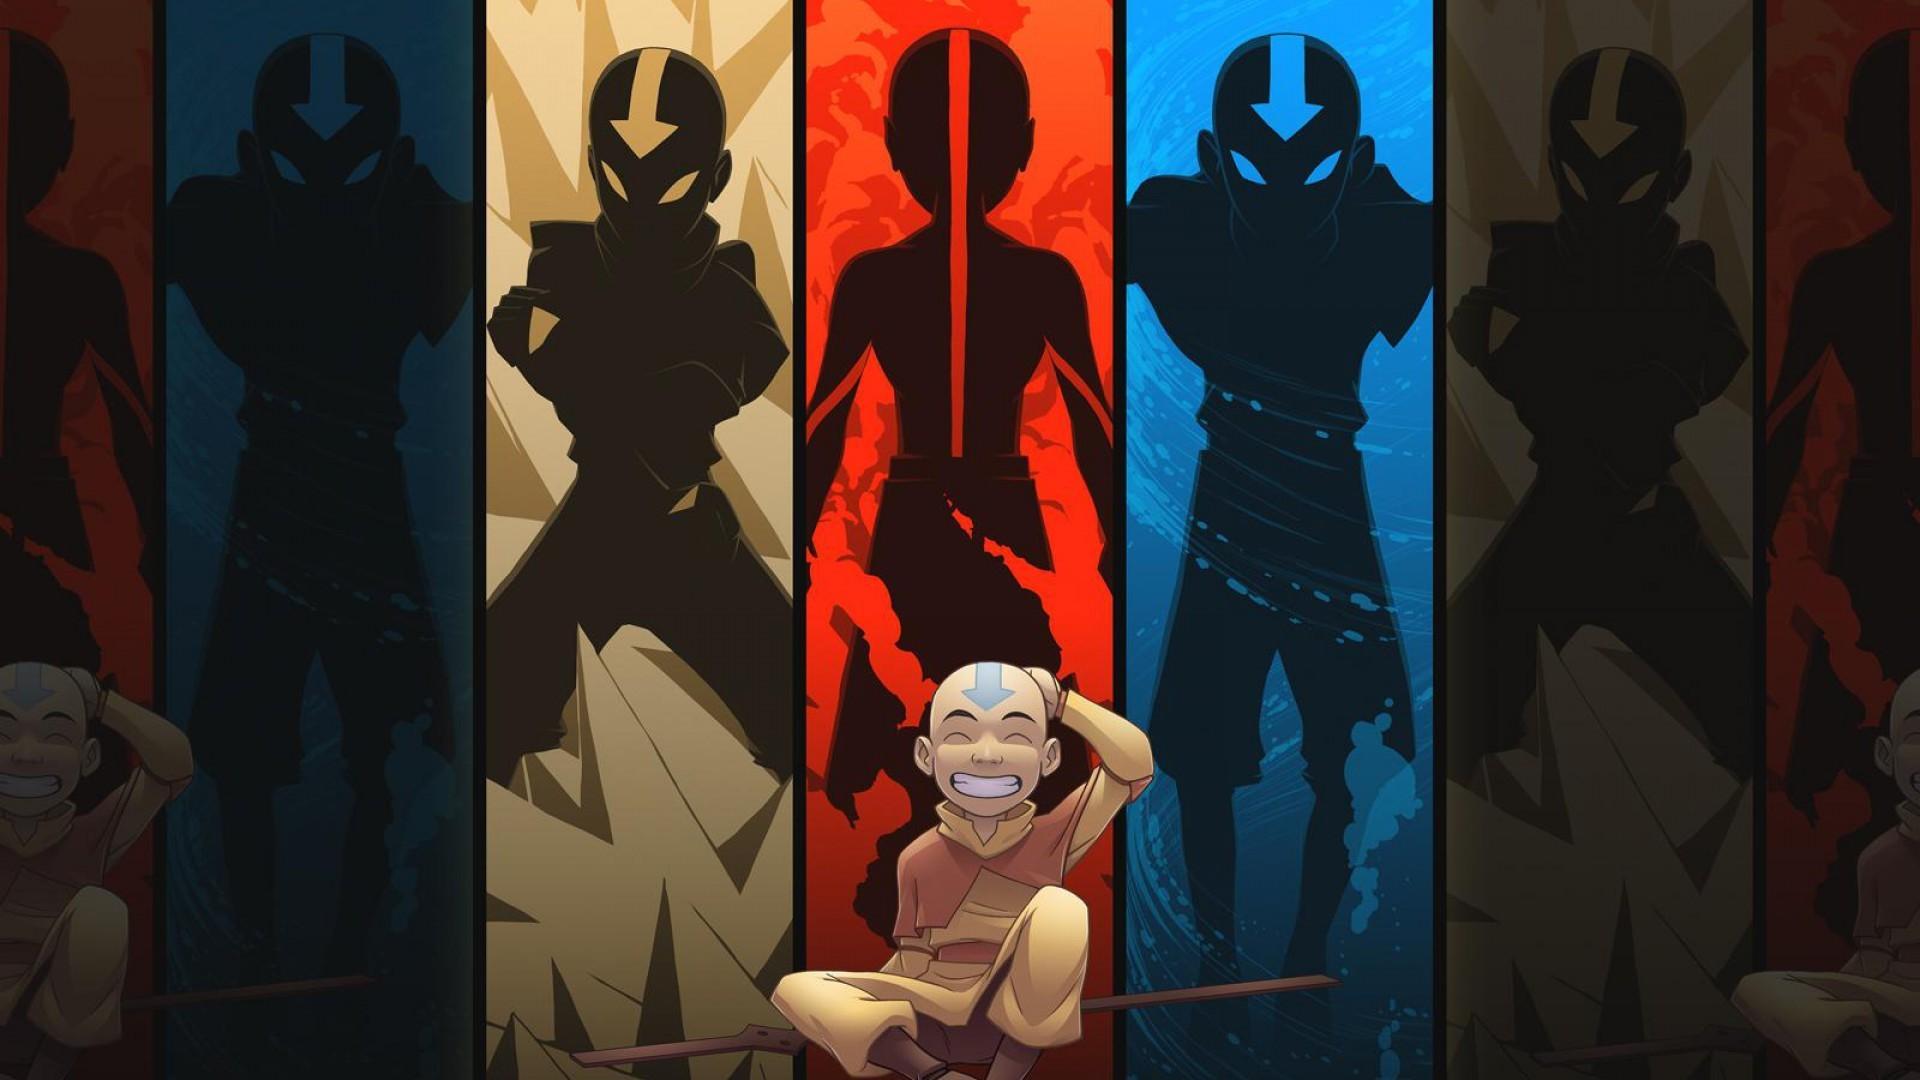 Avatar the last Airbender wallpaper (1)